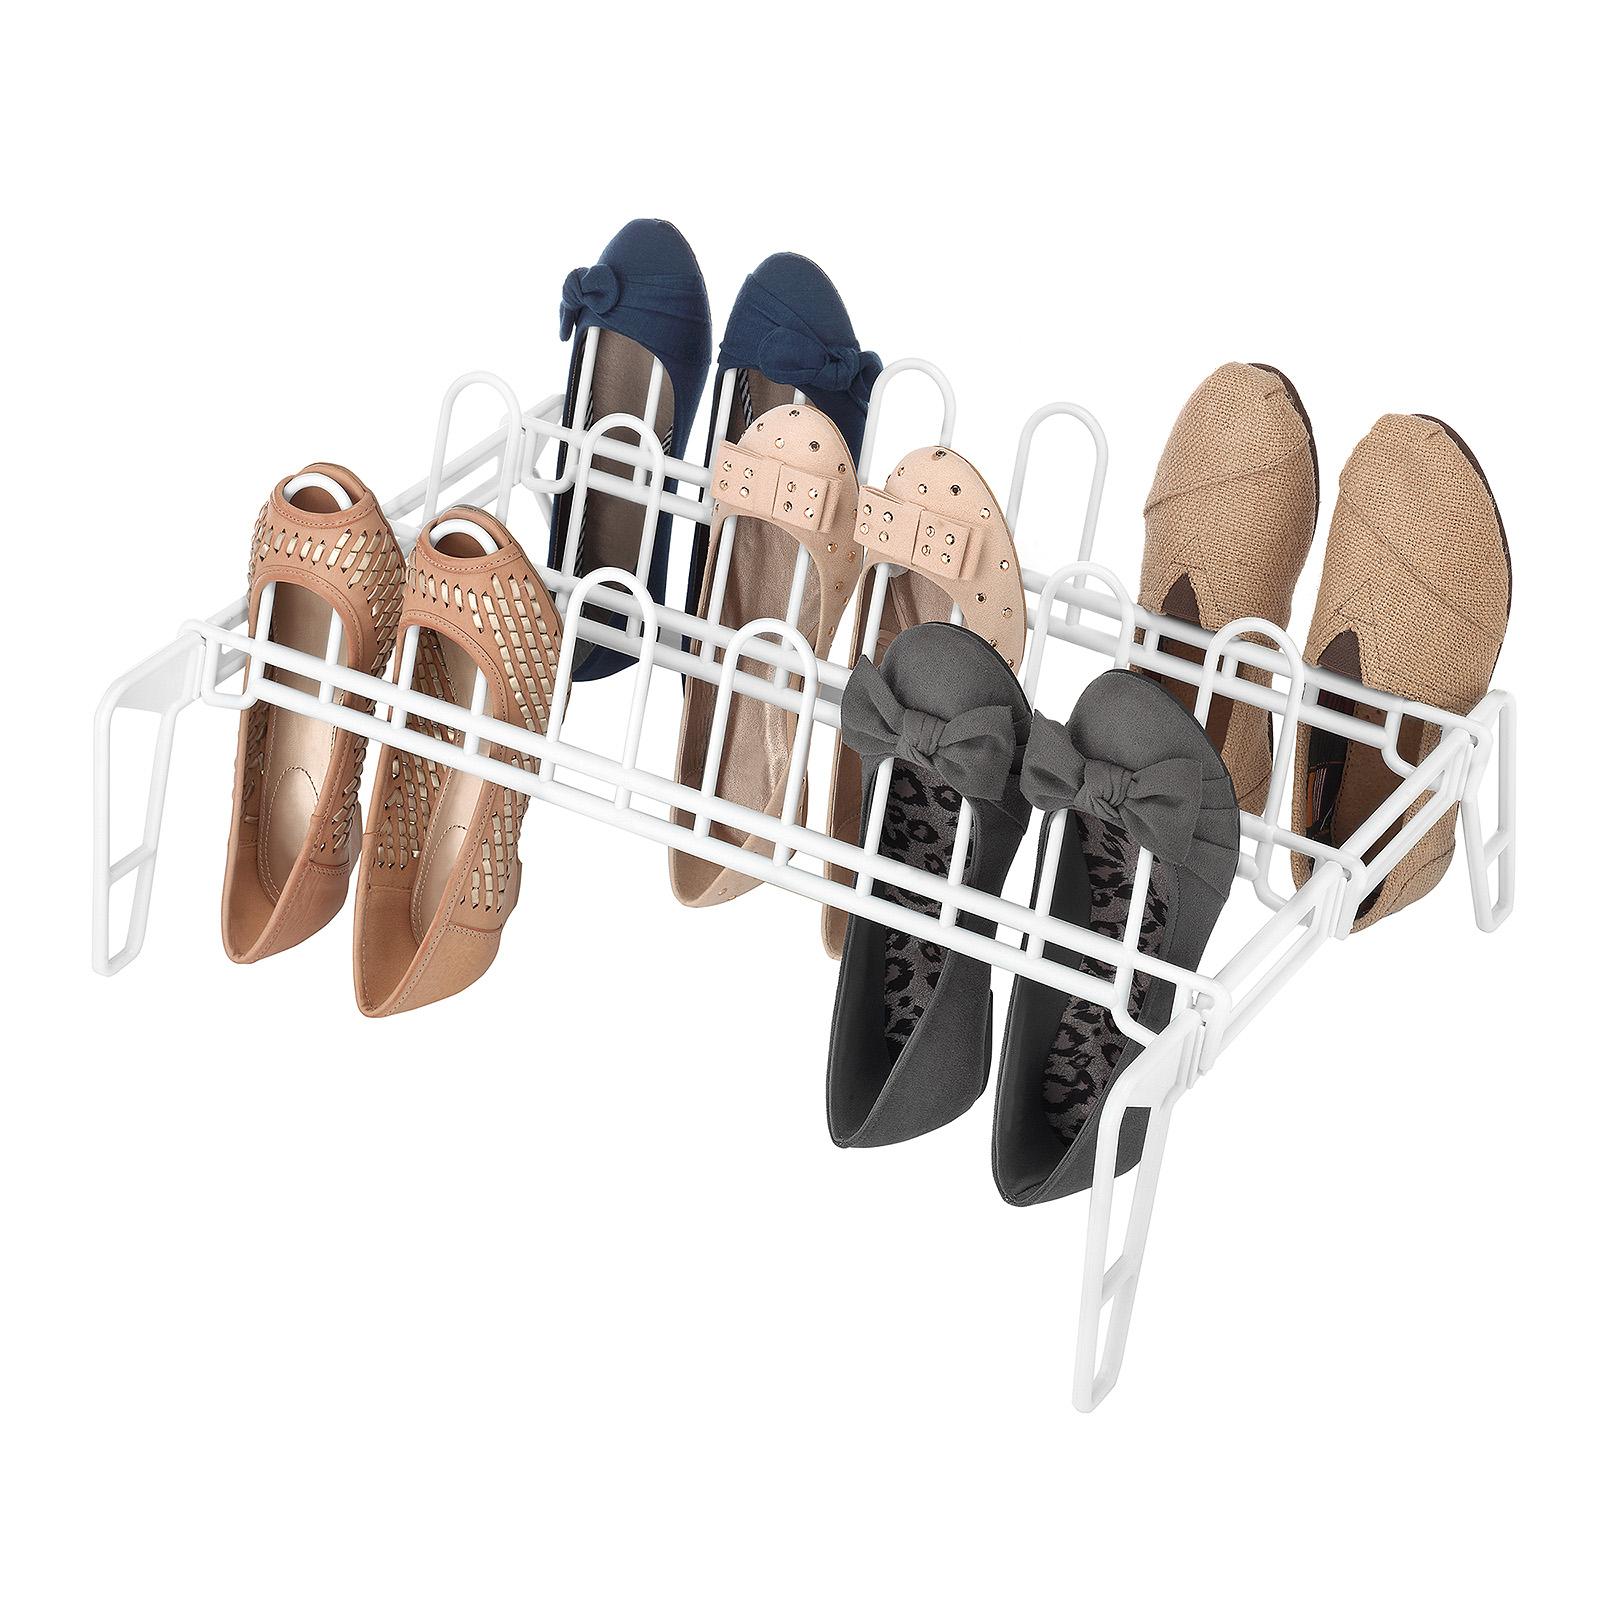 Essential Home White Floor Shoe Rack  9 Pair